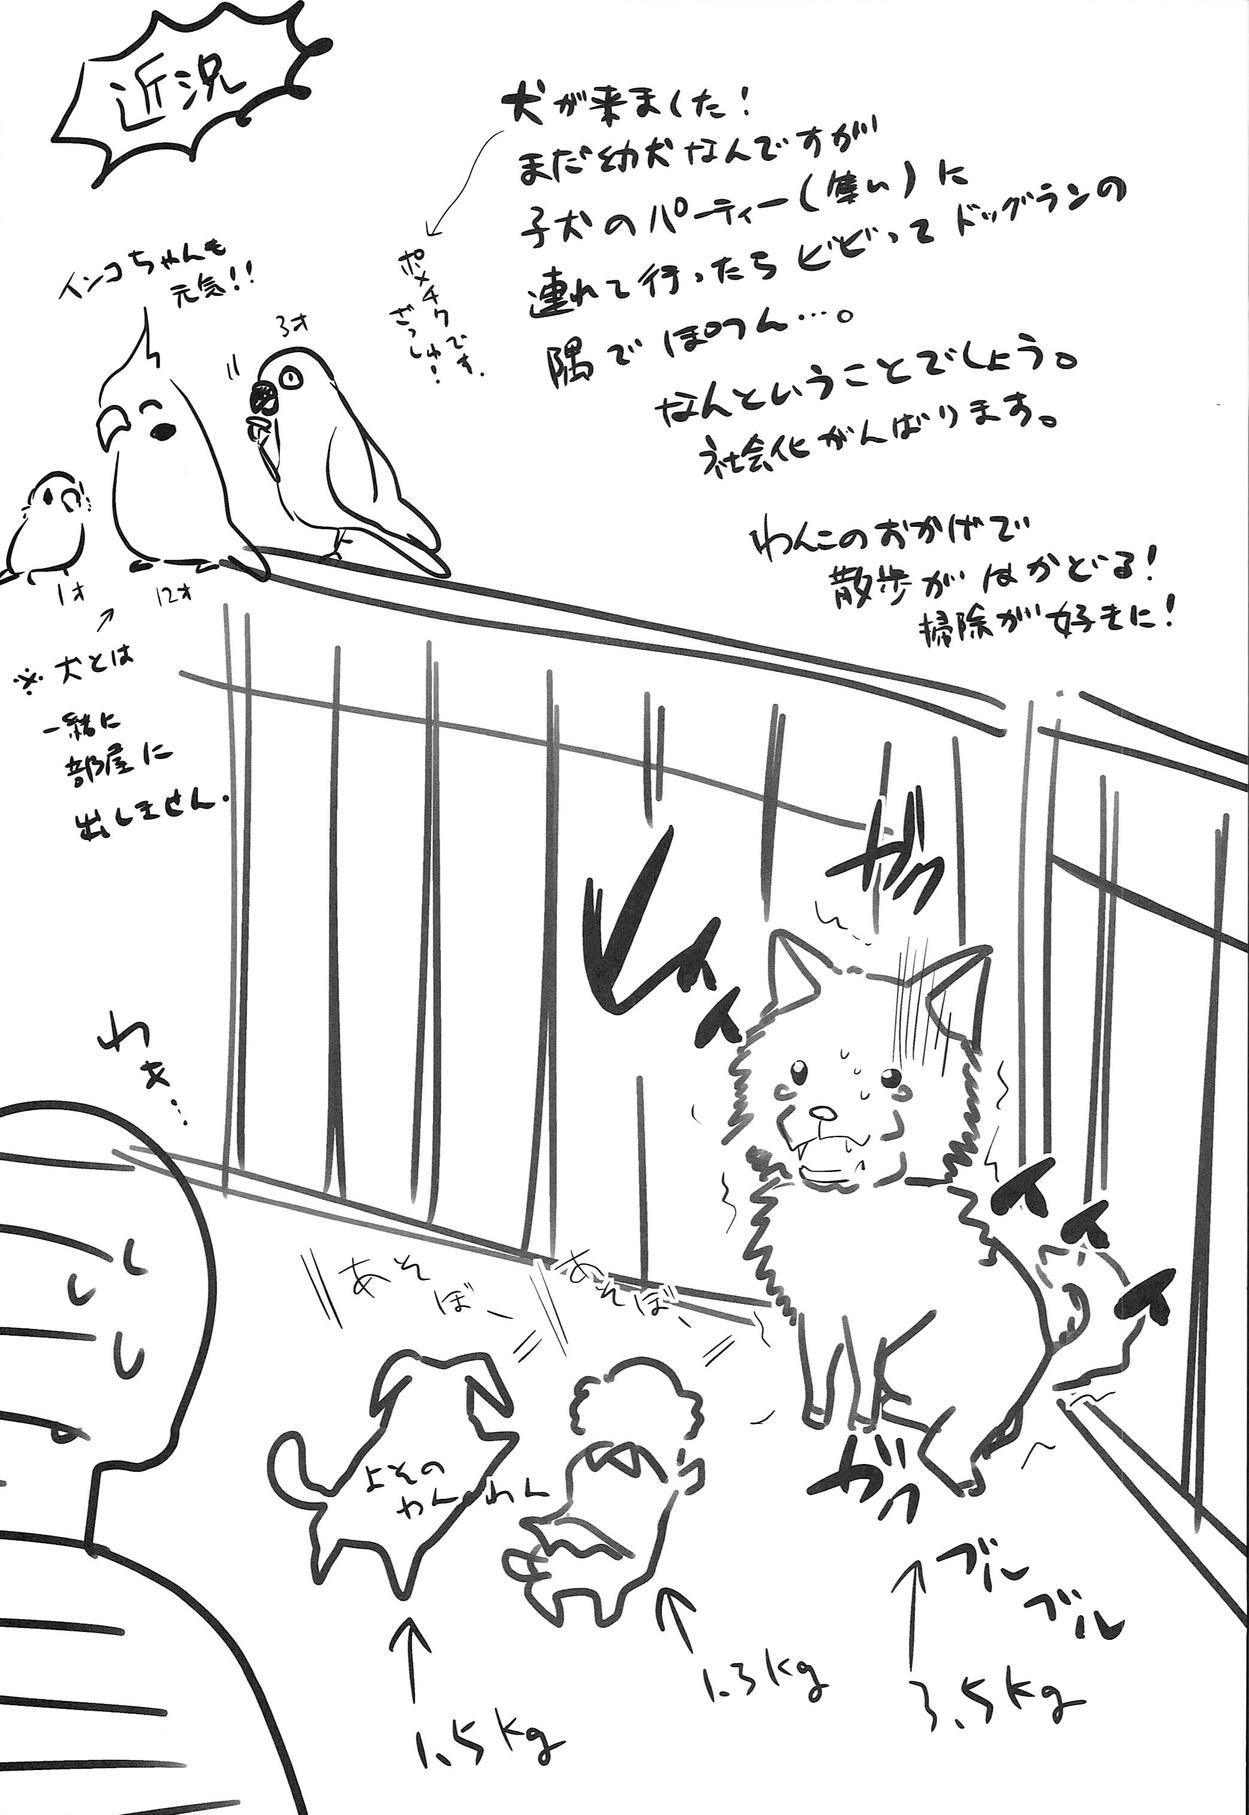 Match Uri no Otokonoko to Kime-seku! | Let's Drug and Fuck the Little Match Trap! 24